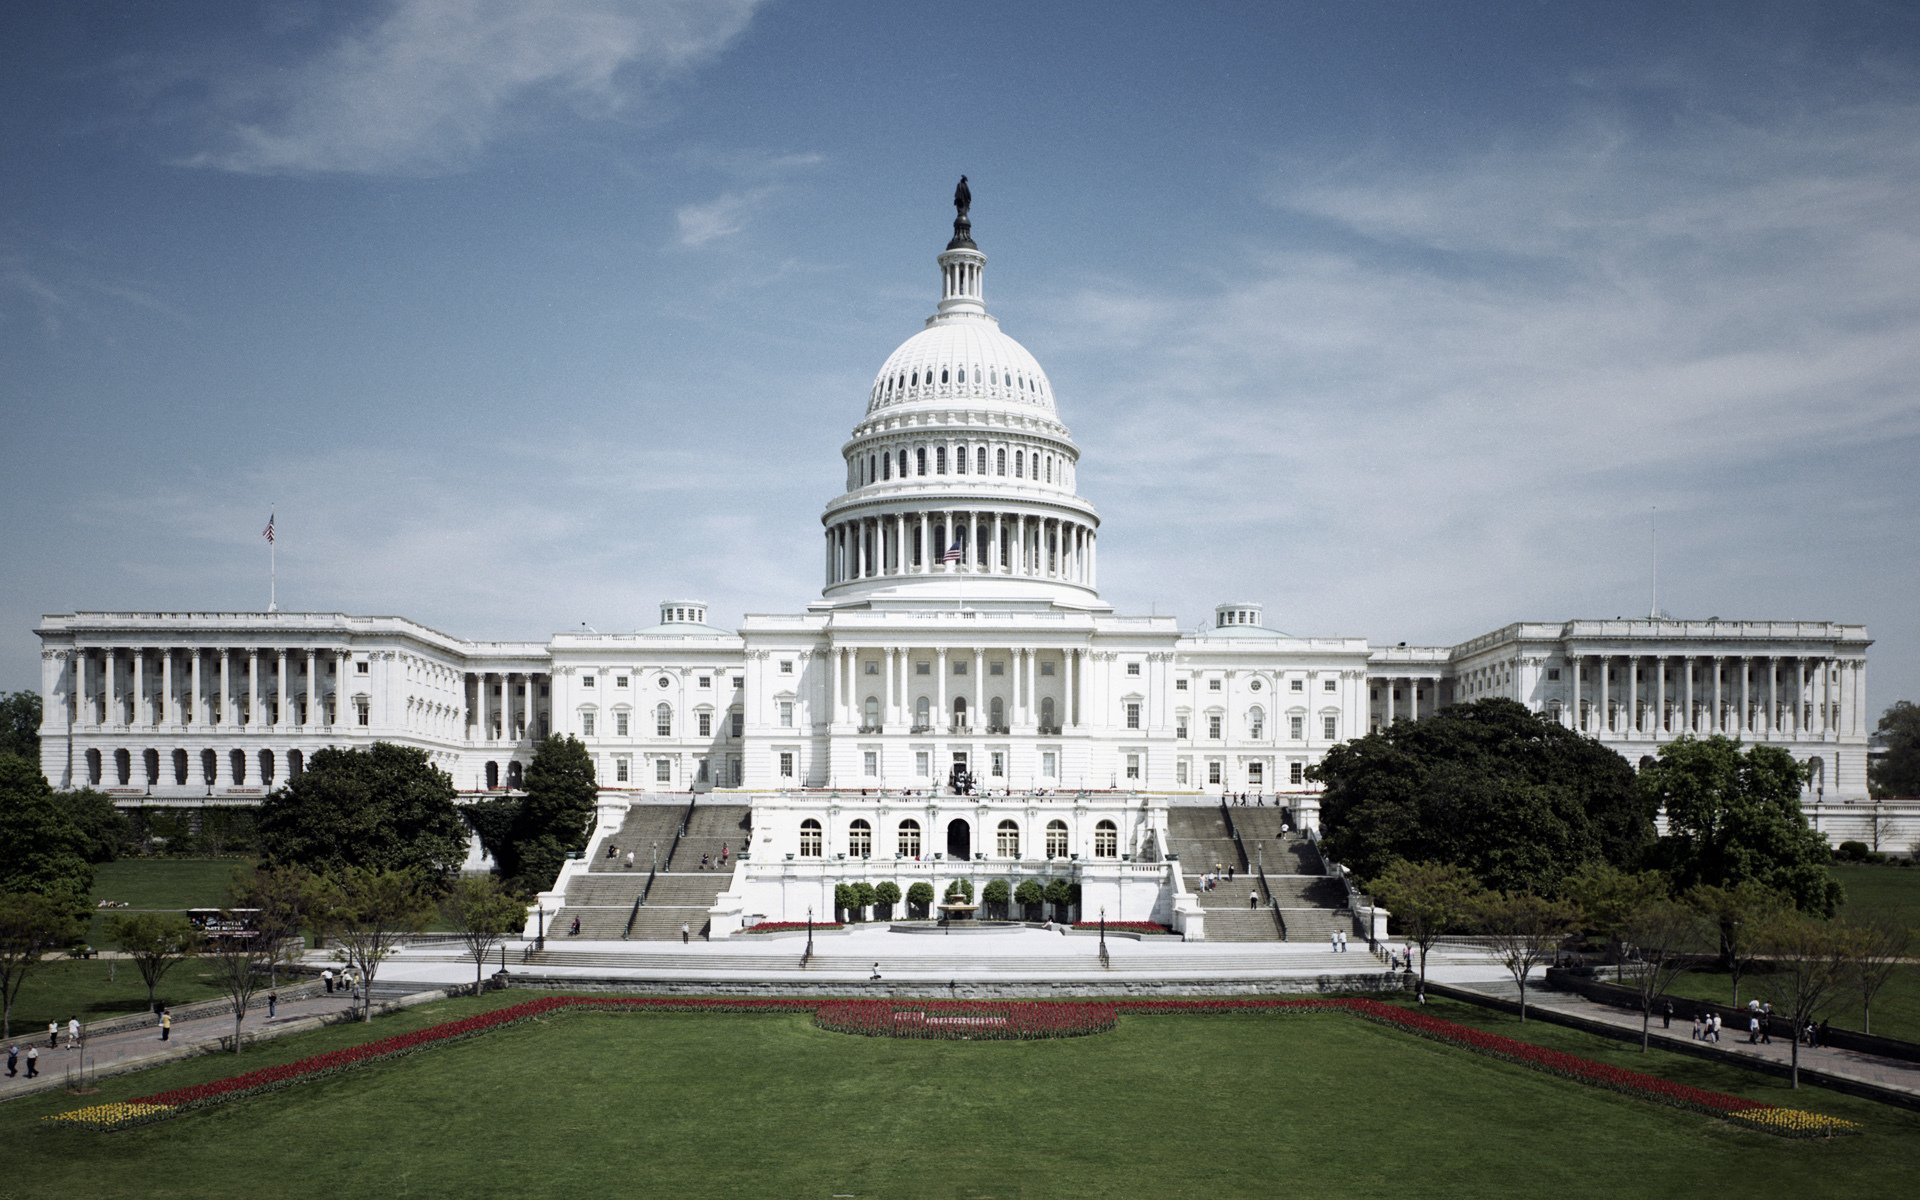 capitol congress usa washington united states HD wallpaper 1920x1200